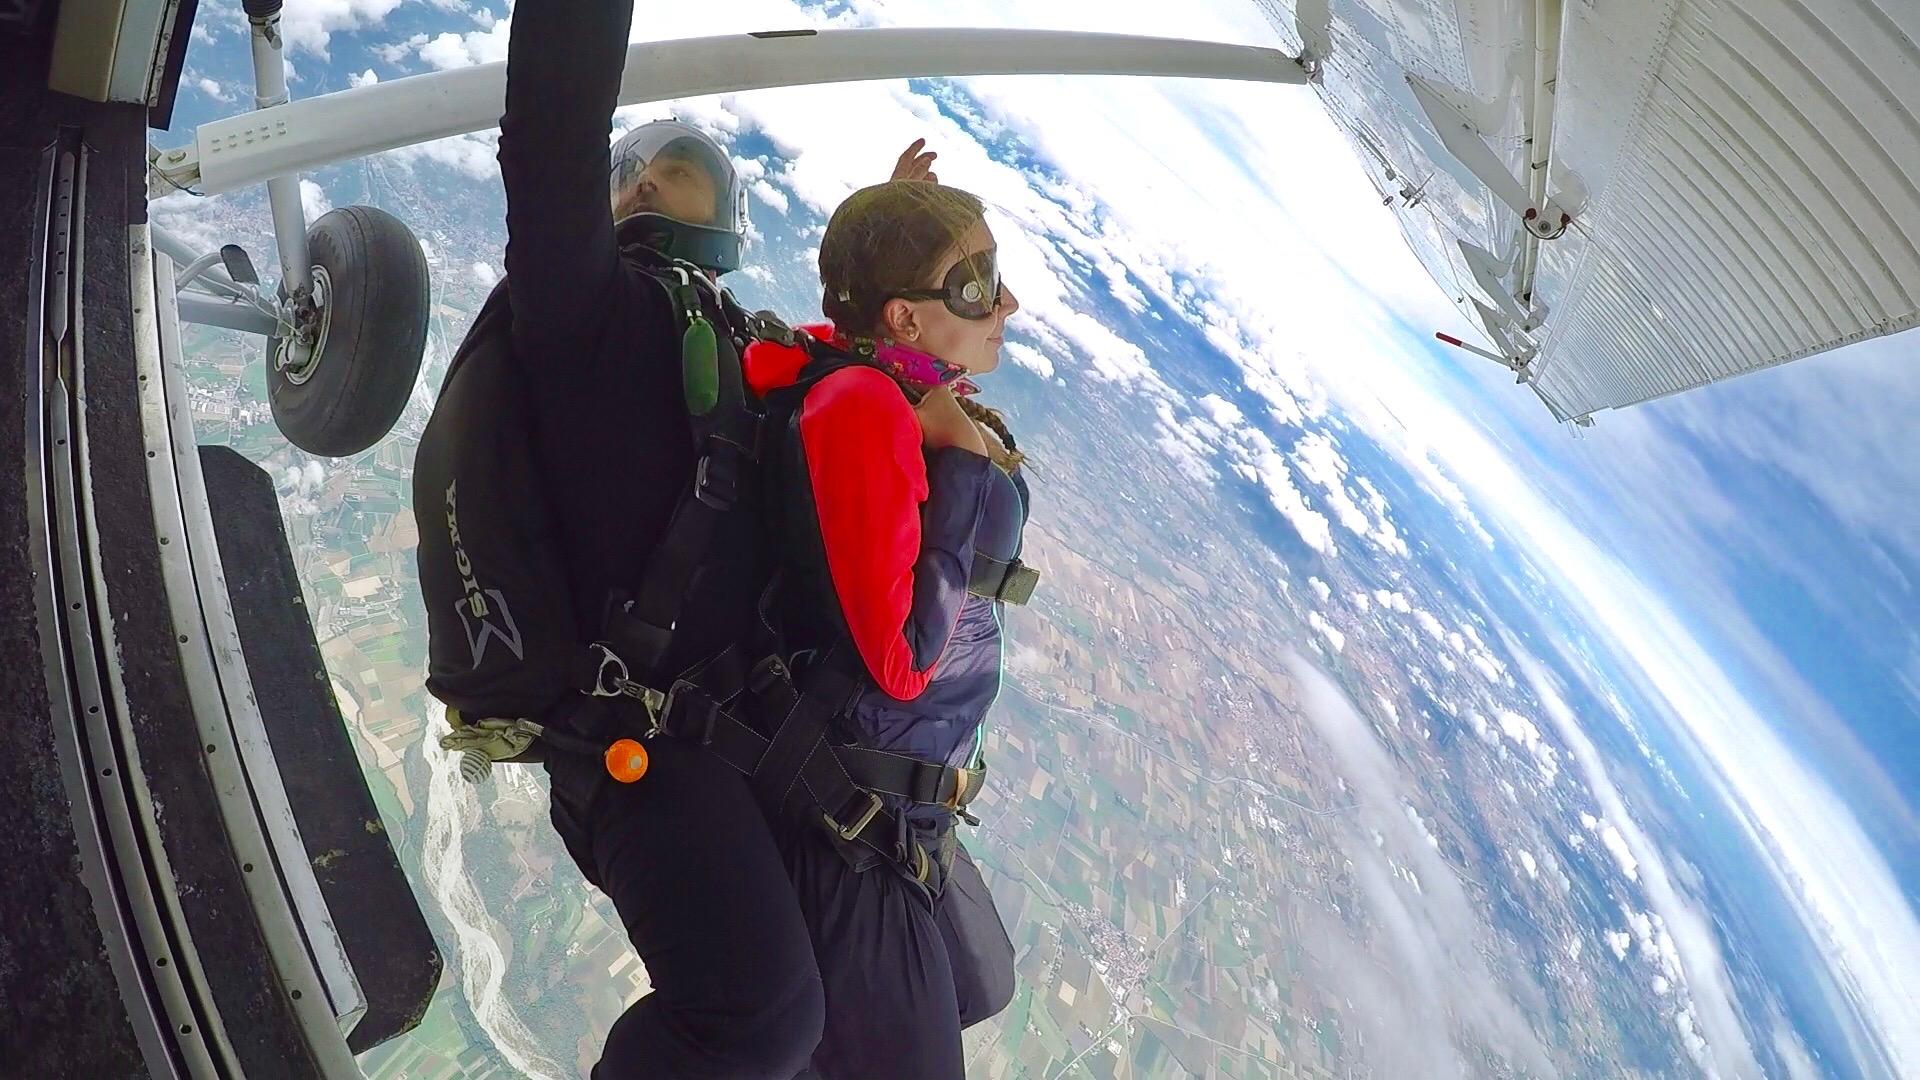 carlotta_skydiving_lustforthesublime